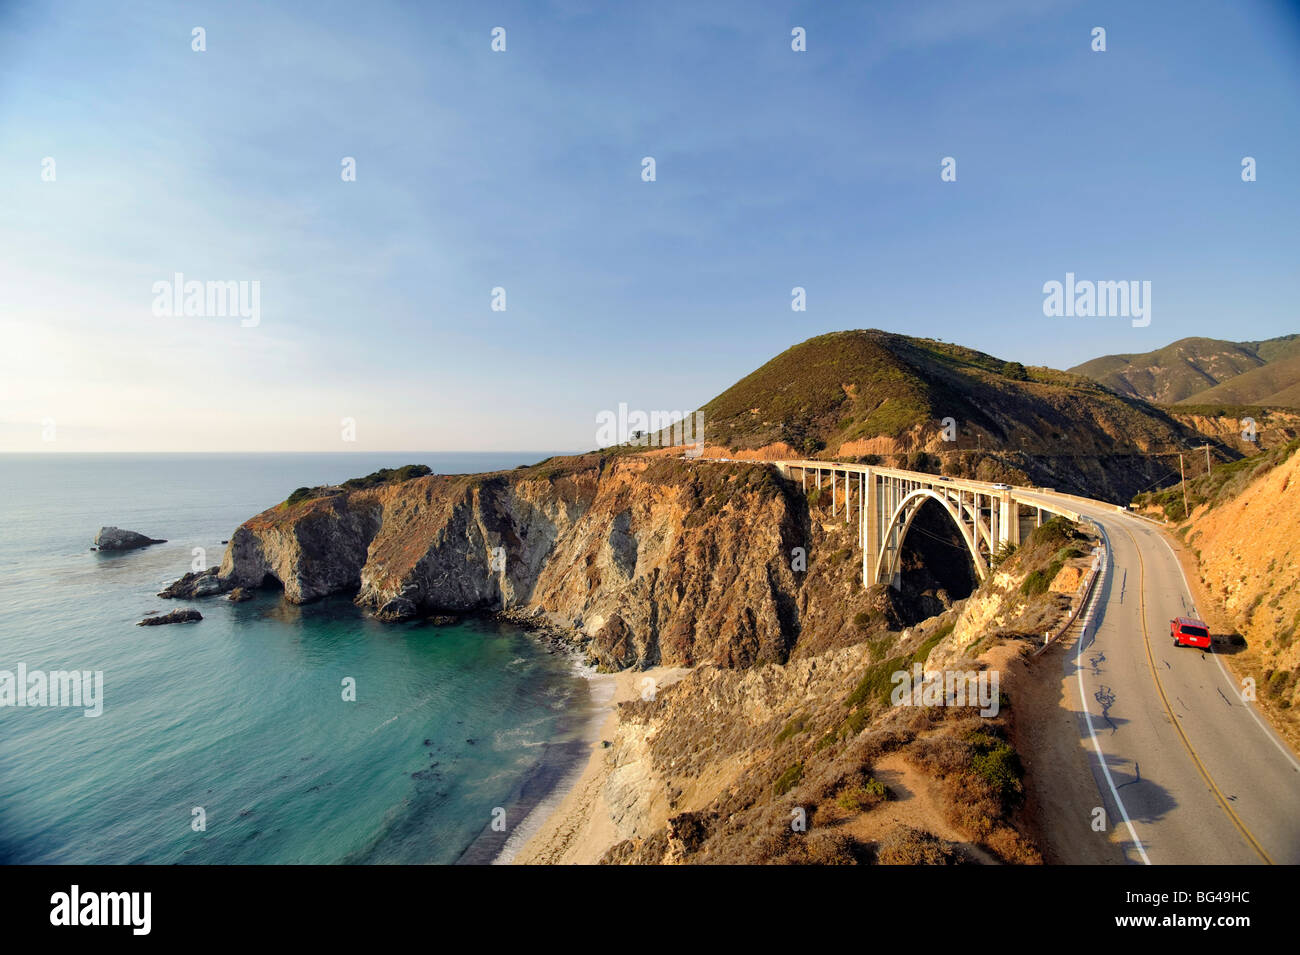 USA, California, Big Sur Pacific Coastline, Bixby Bridge and Highway 1 - Stock Image